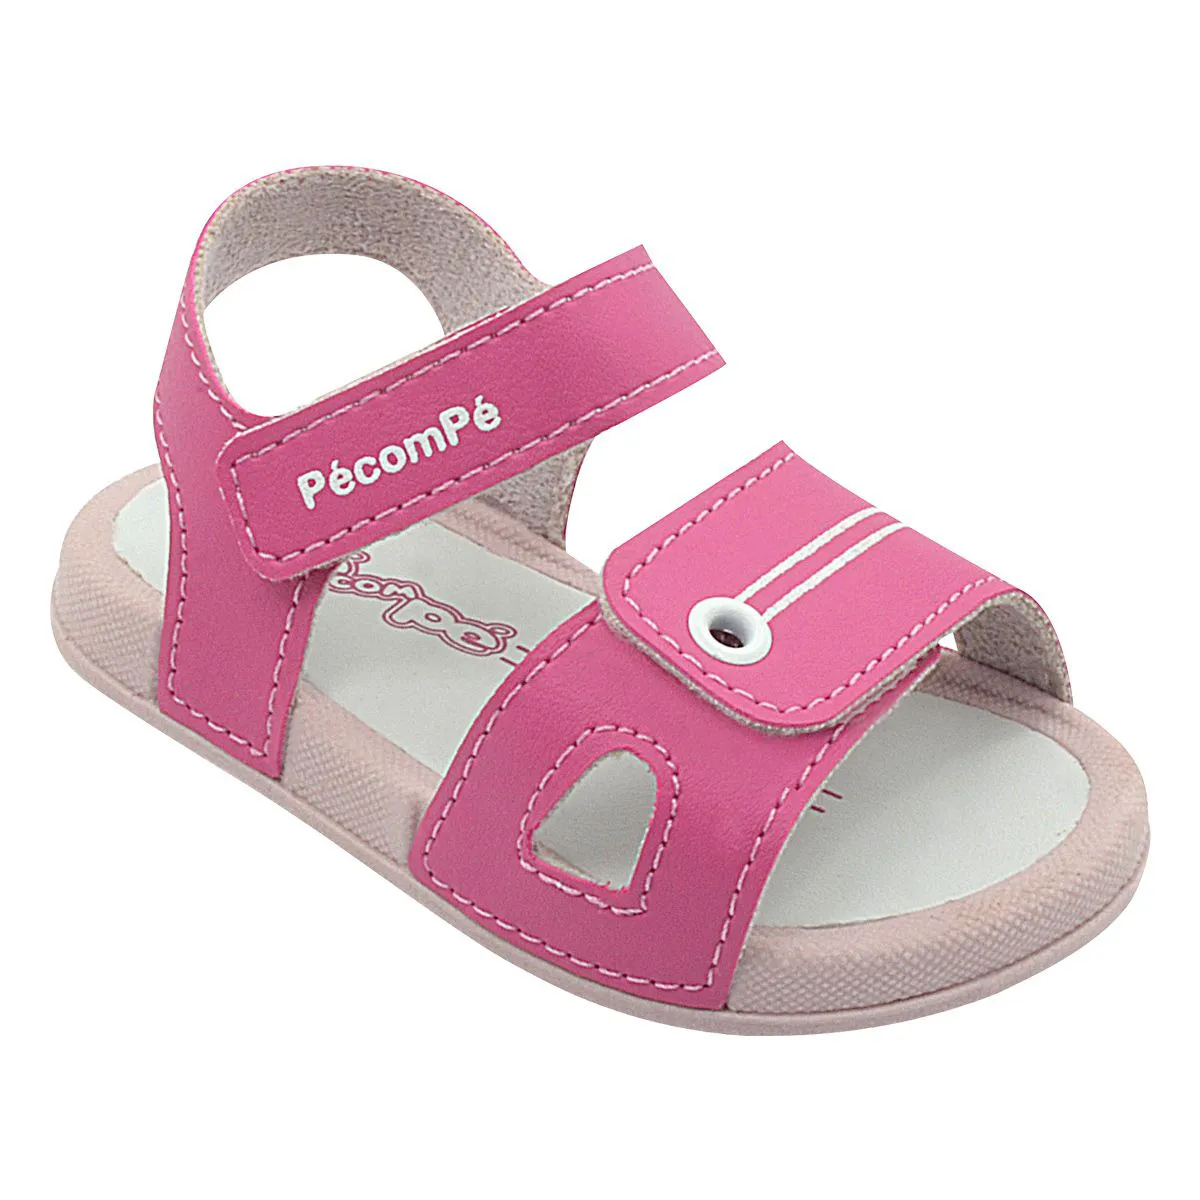 Papete Neném Infantil com Velcro Pink Feminina